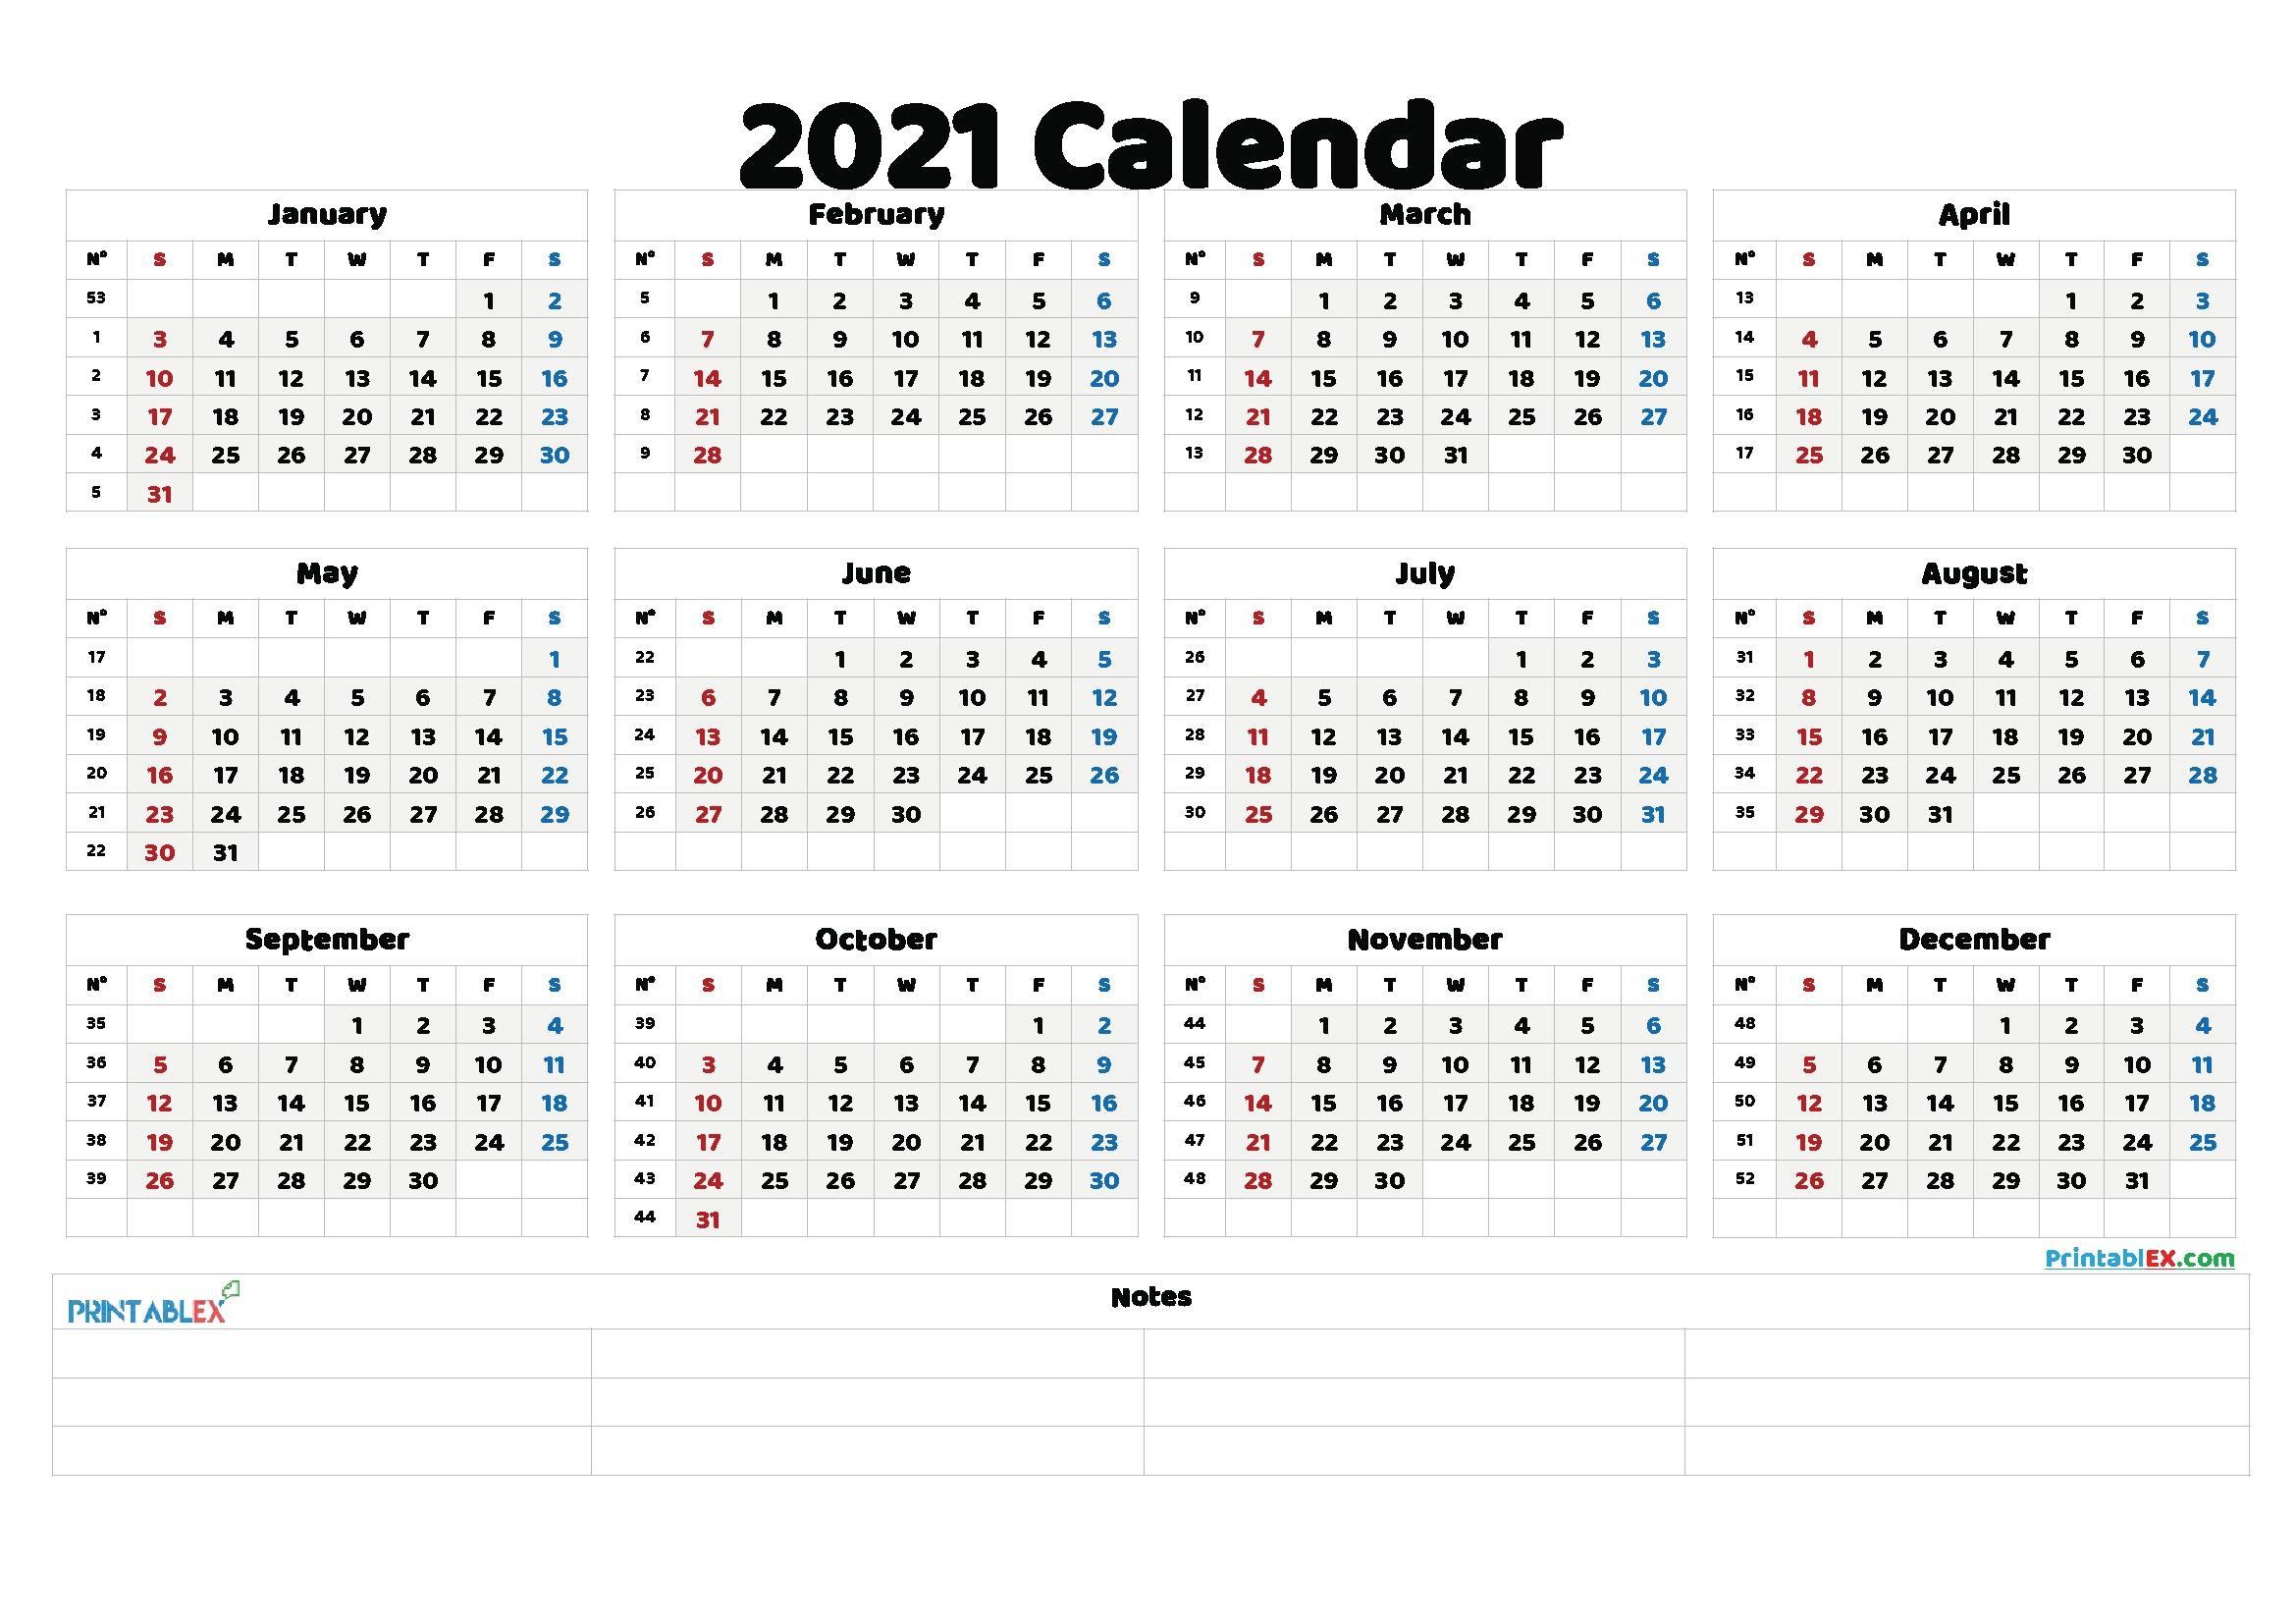 Free Printable Numbers For Calendar | Ten Free Printable for Free Printable Calendars 2021 With Lines